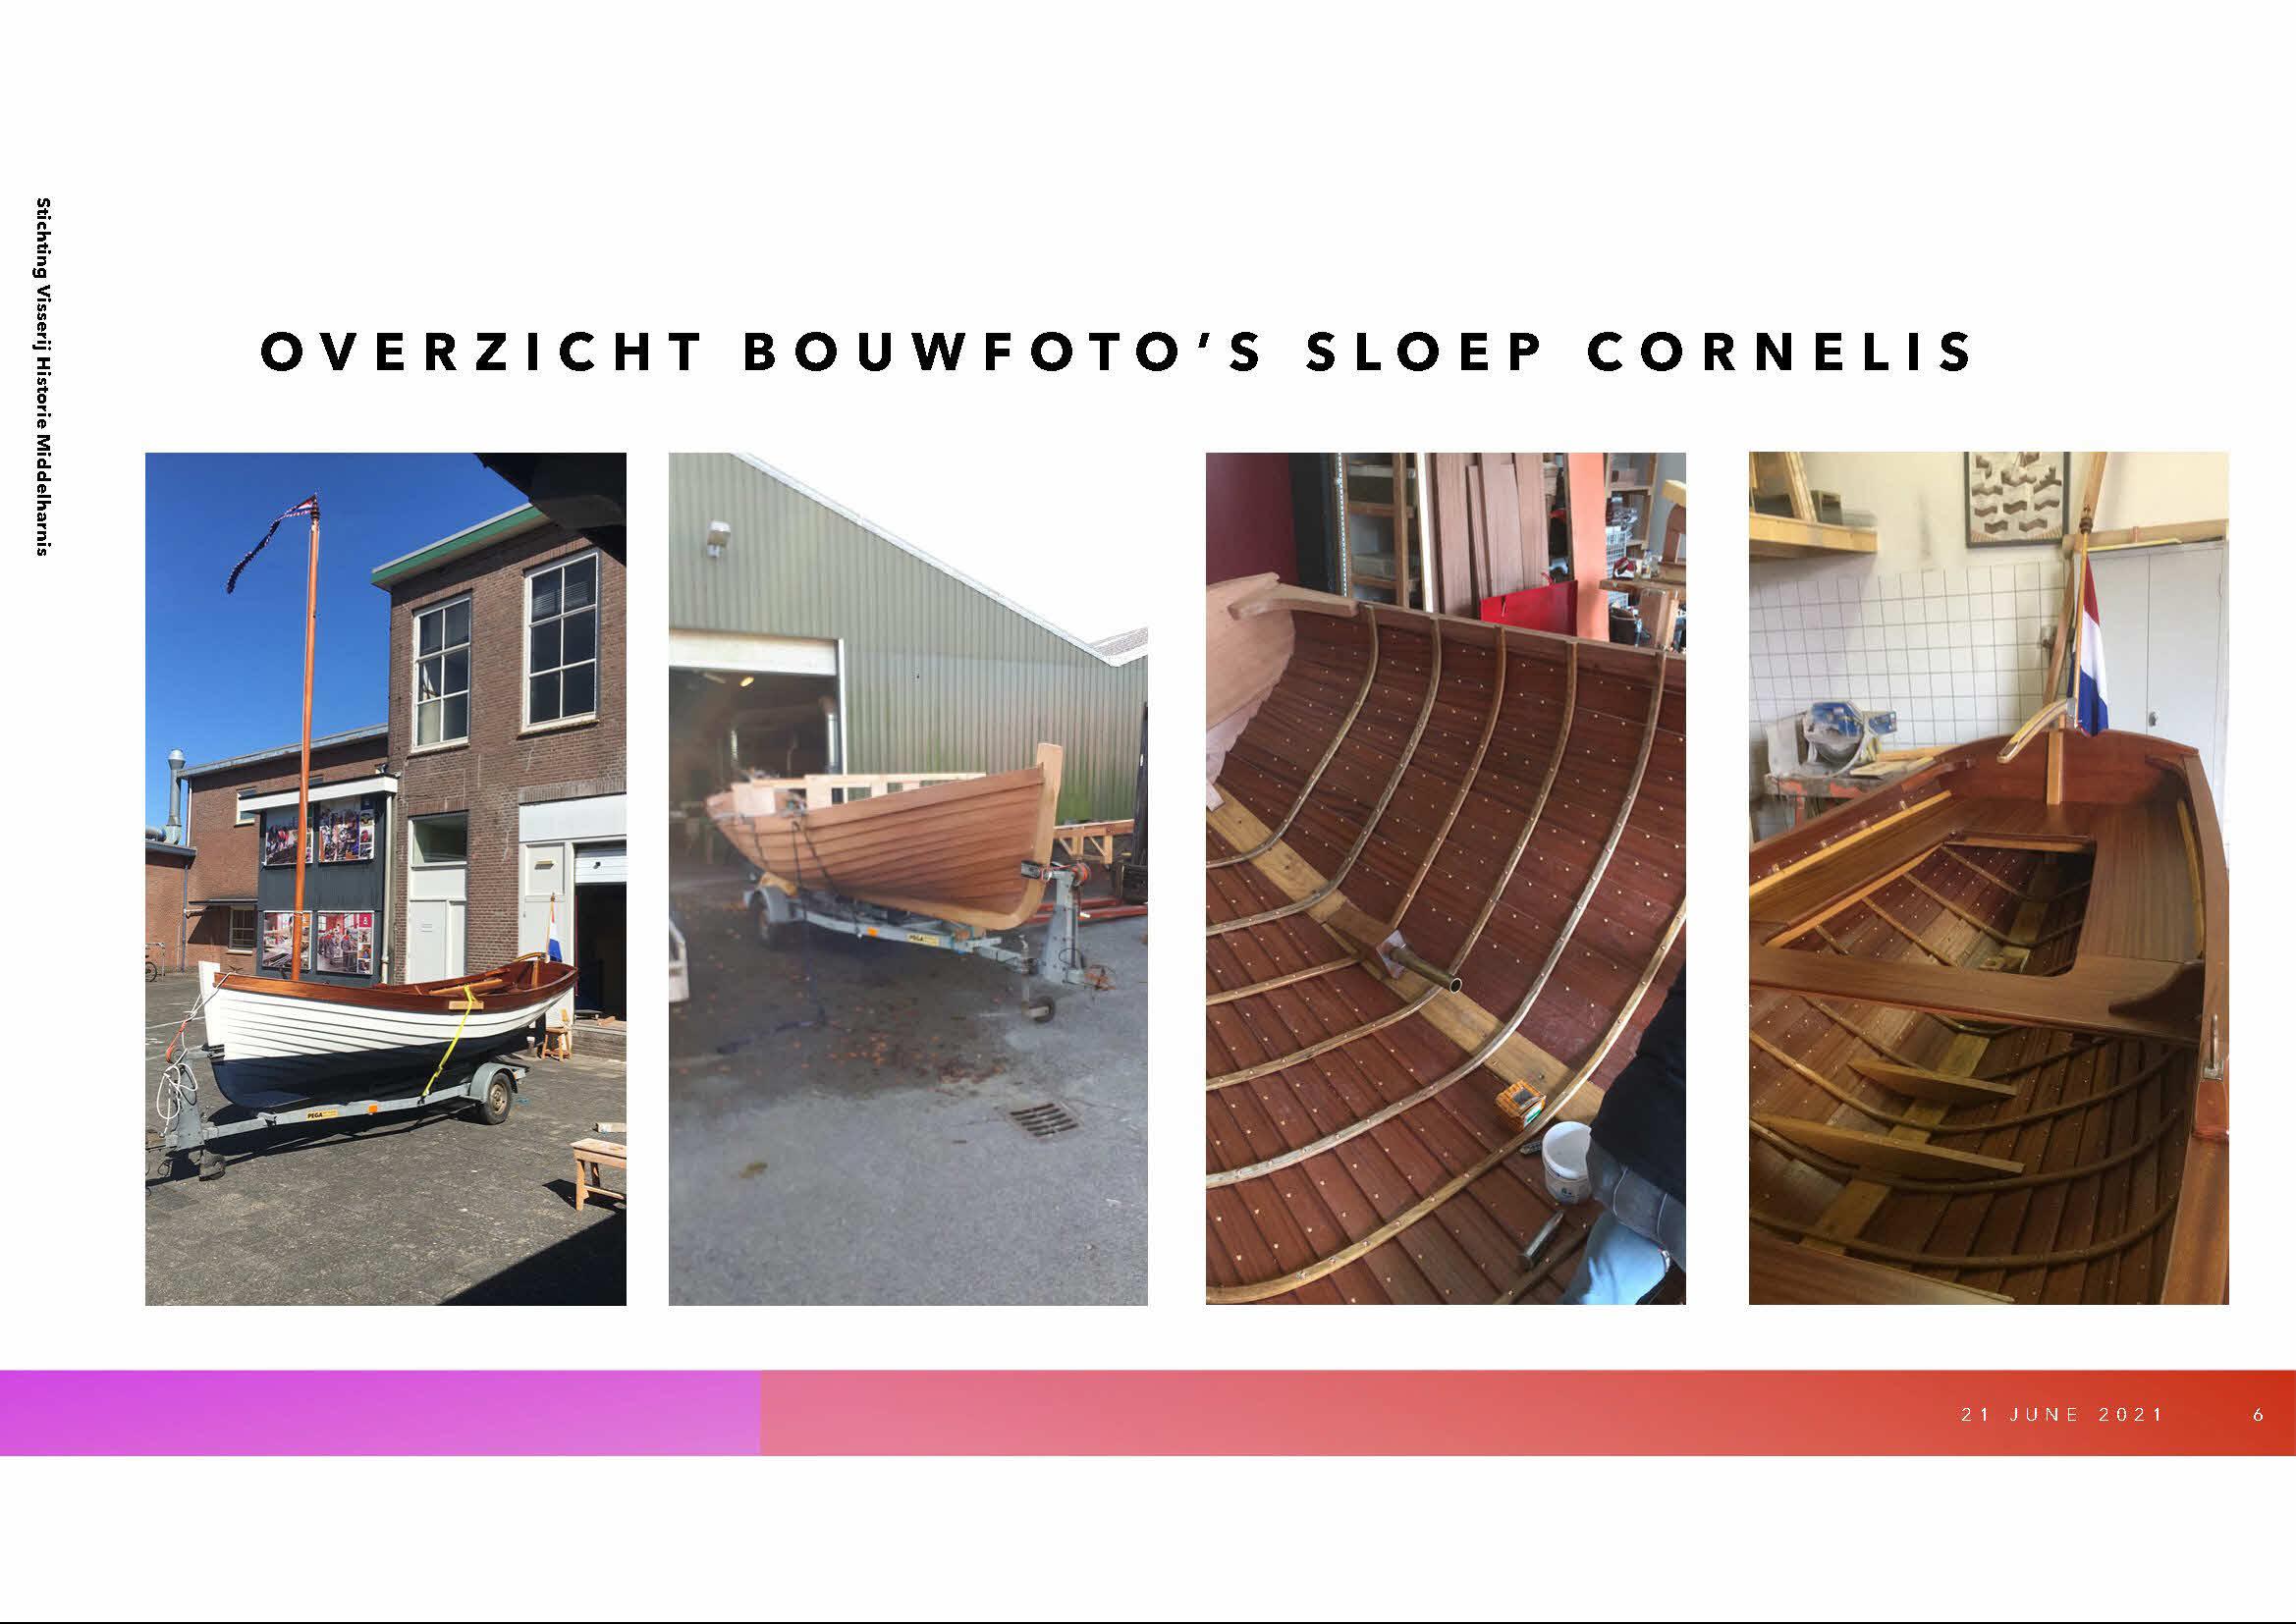 jepe Cornelis